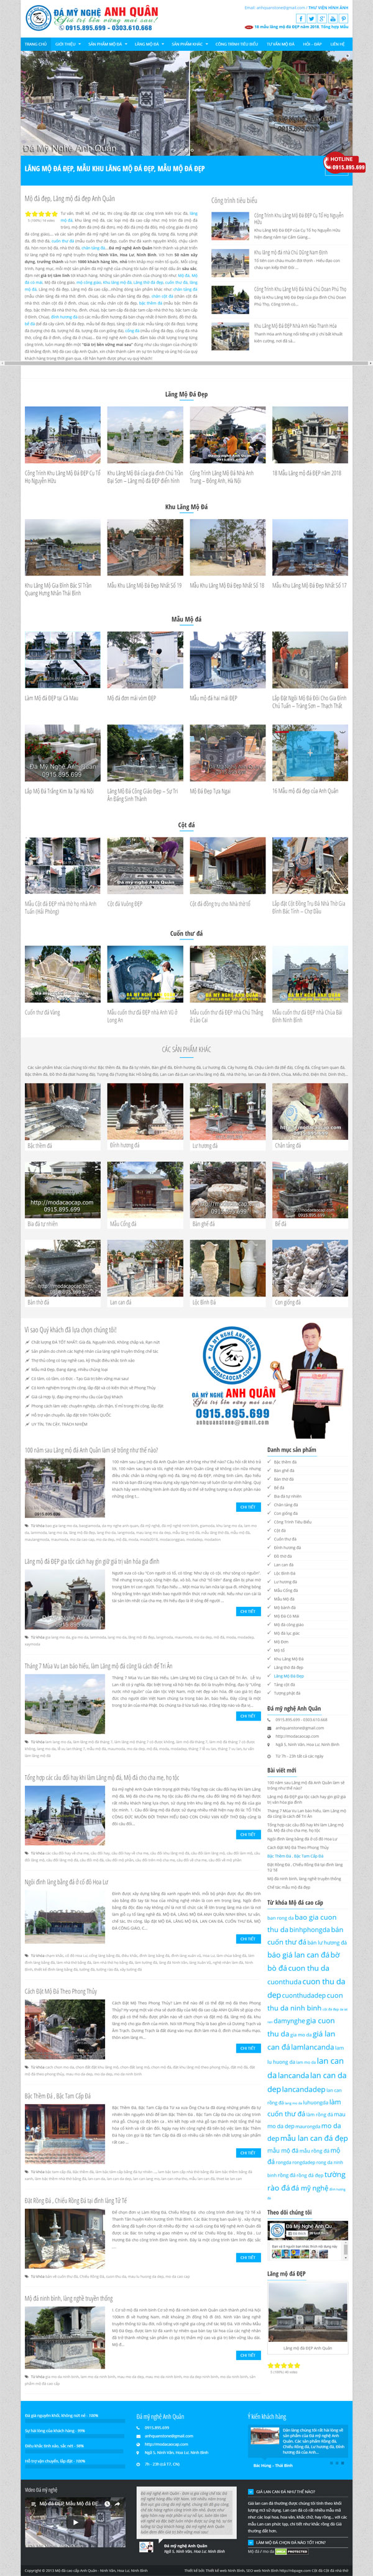 Thiet-ke-Website-Da-my-nghe-Anh-Quan-Ninh-Binh